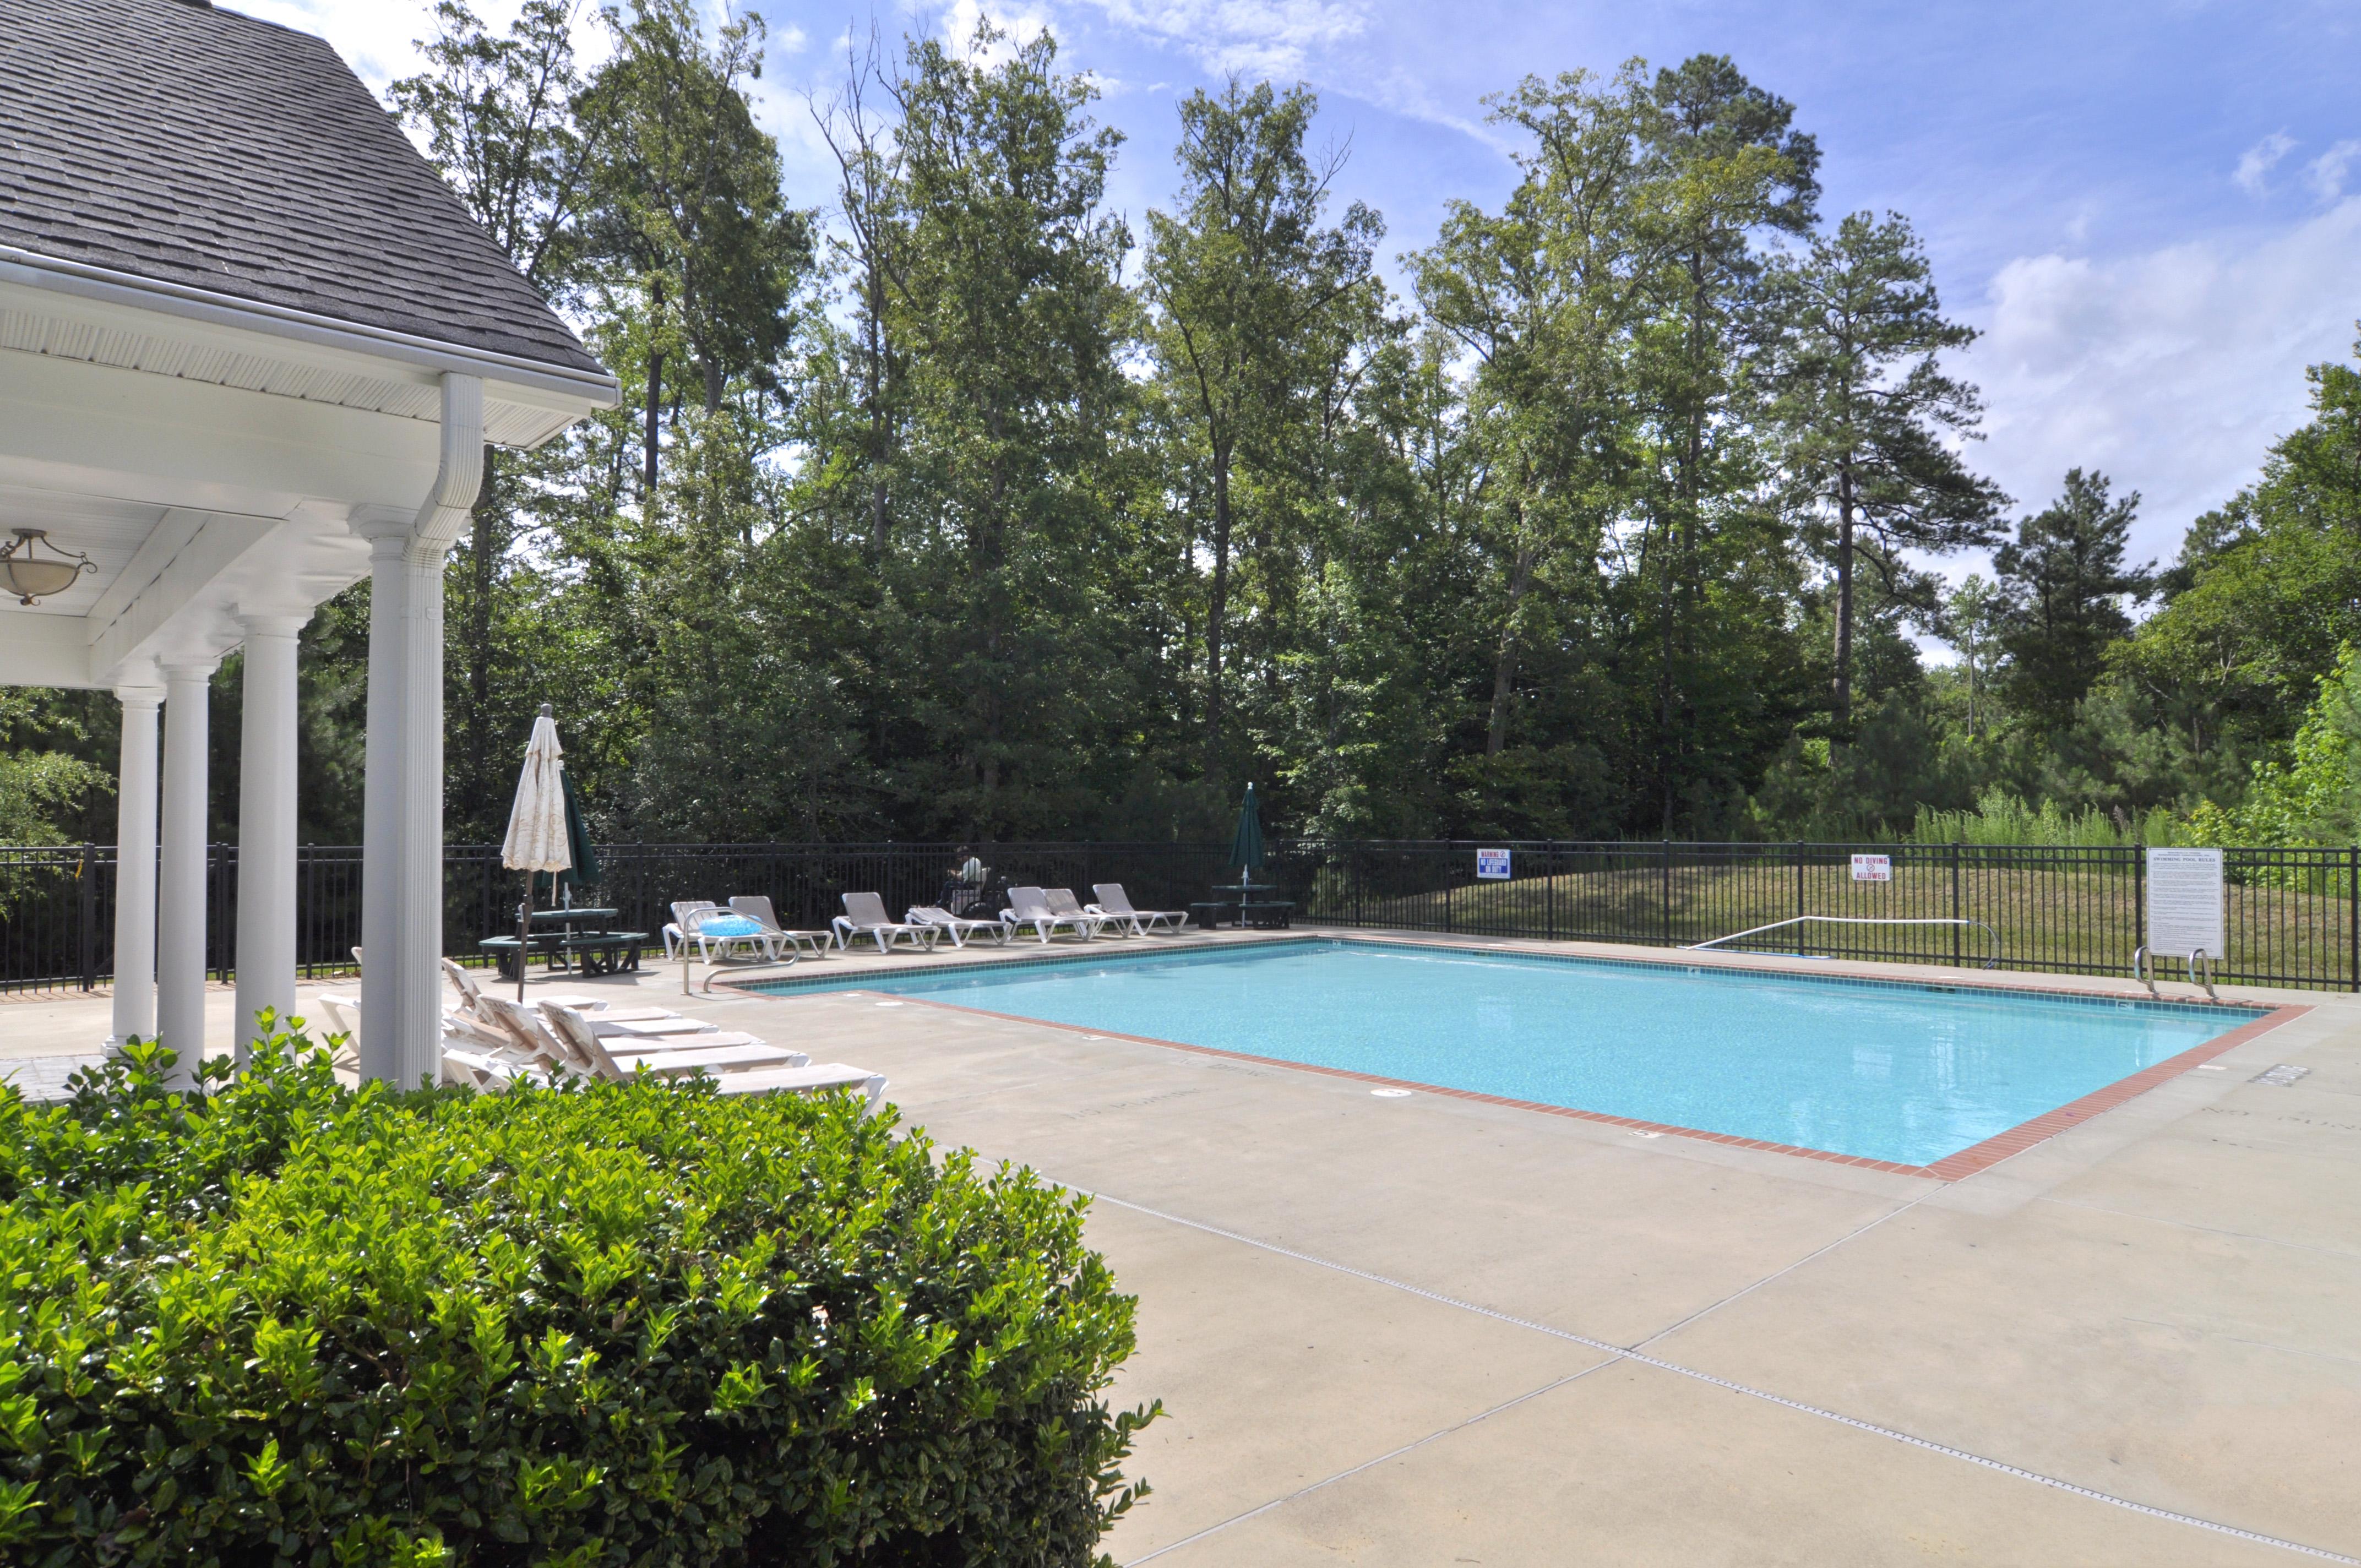 Monticello Woods community pool